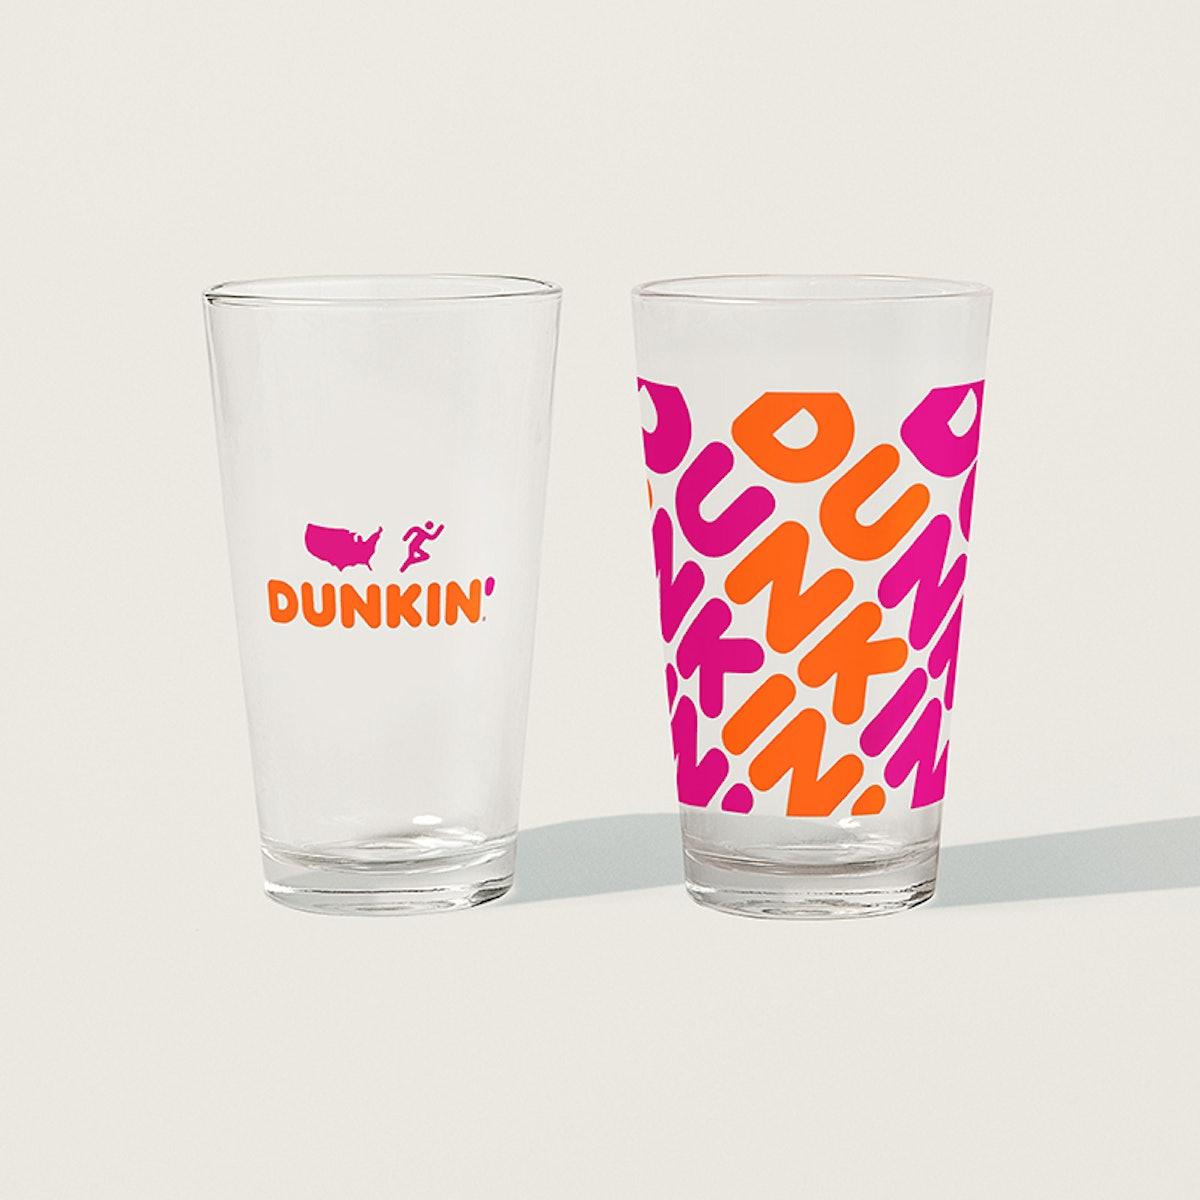 Dunkin' Cheersin' Pint Glasses